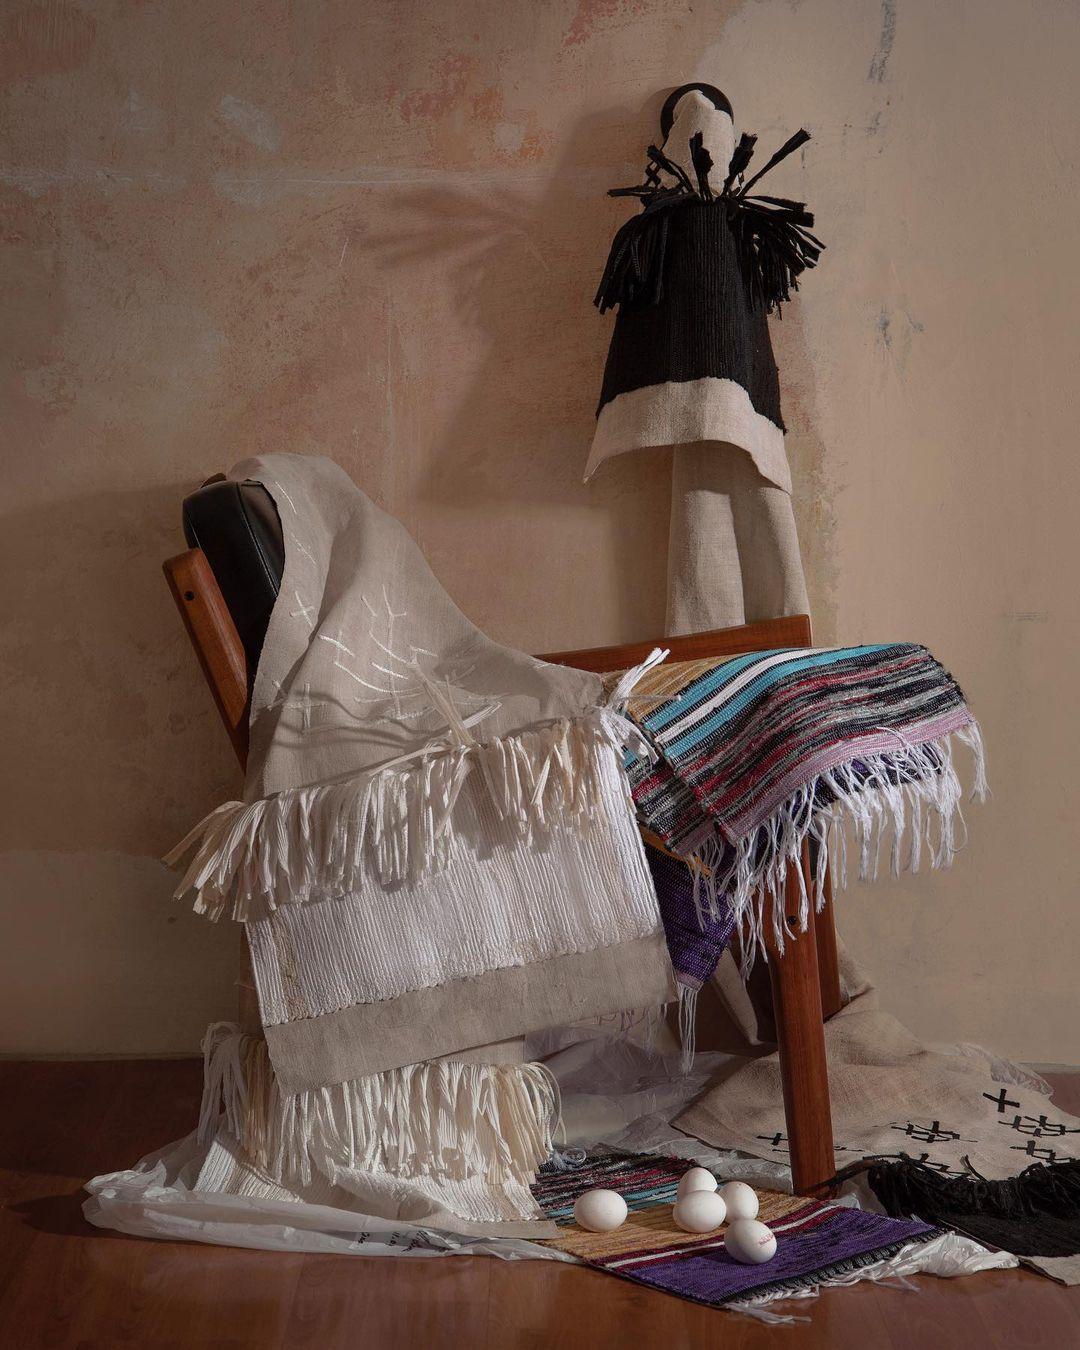 LITKOVSKAYA представили пасхальную коллекцию текстиля для дома